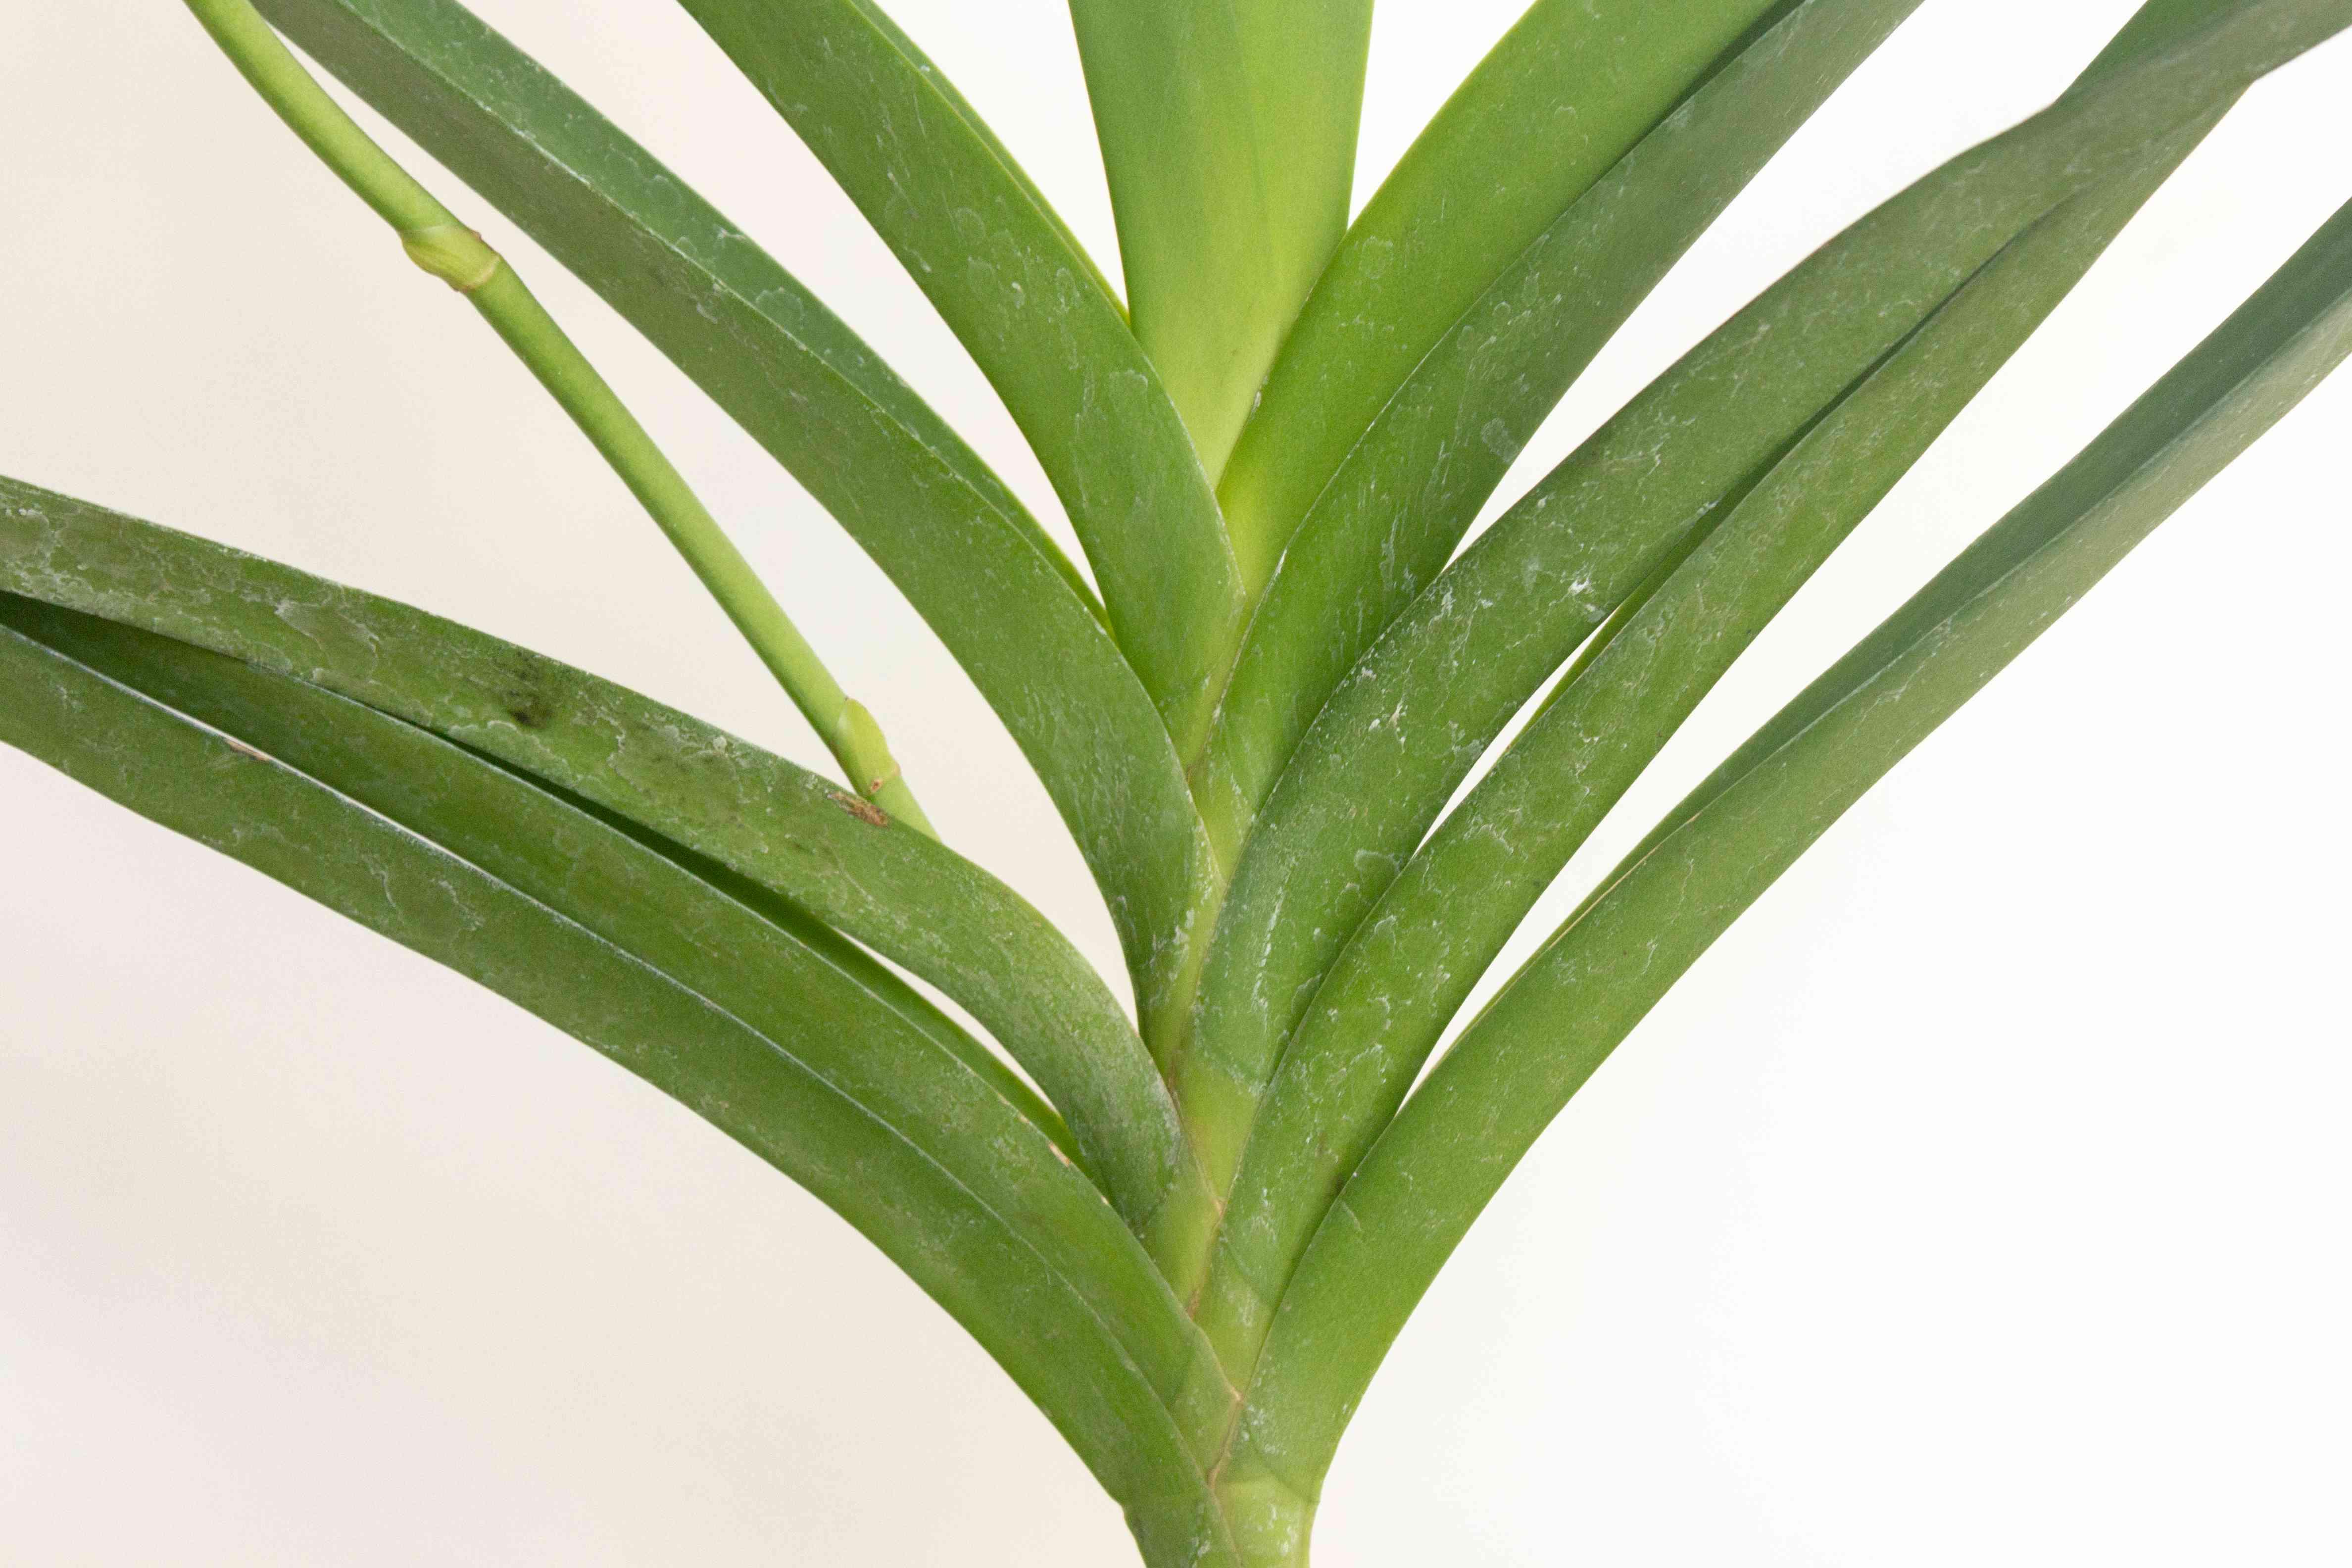 vanda orchid leaves